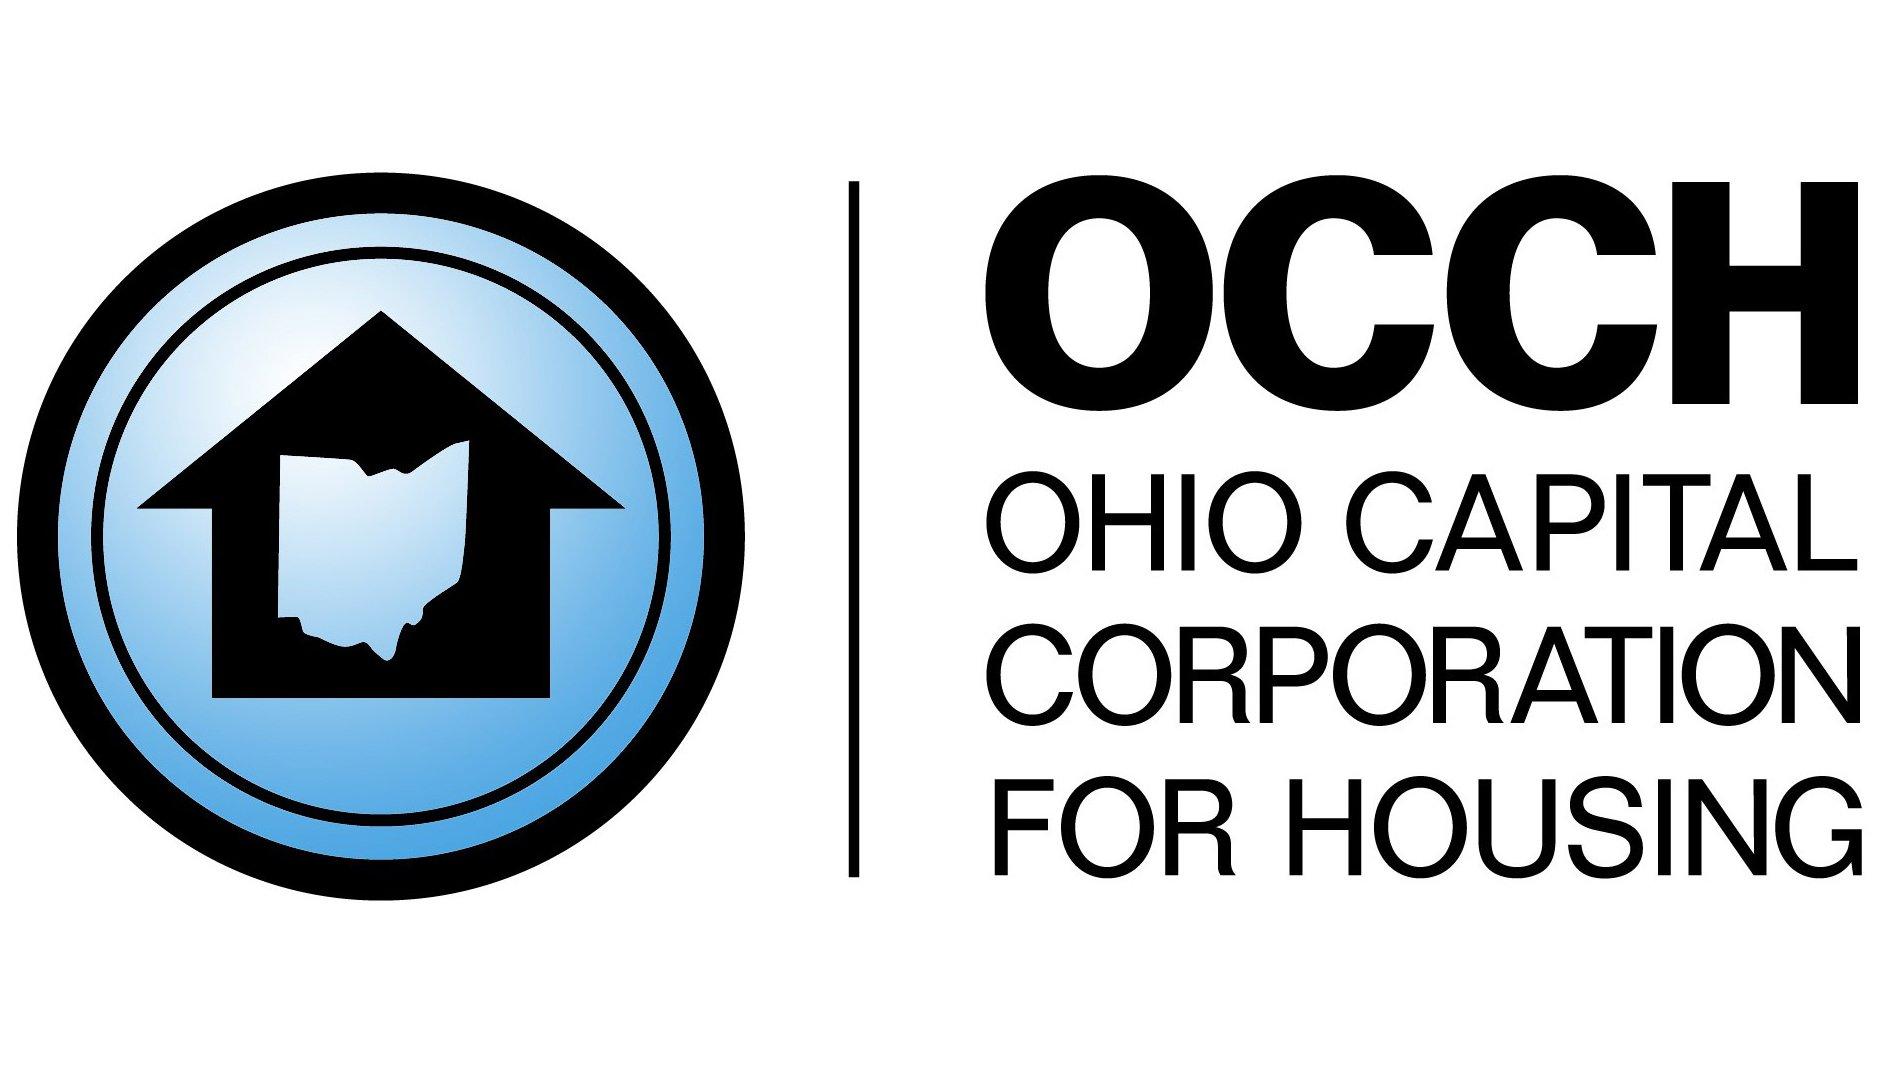 Ohio Capital Corporation for Housing